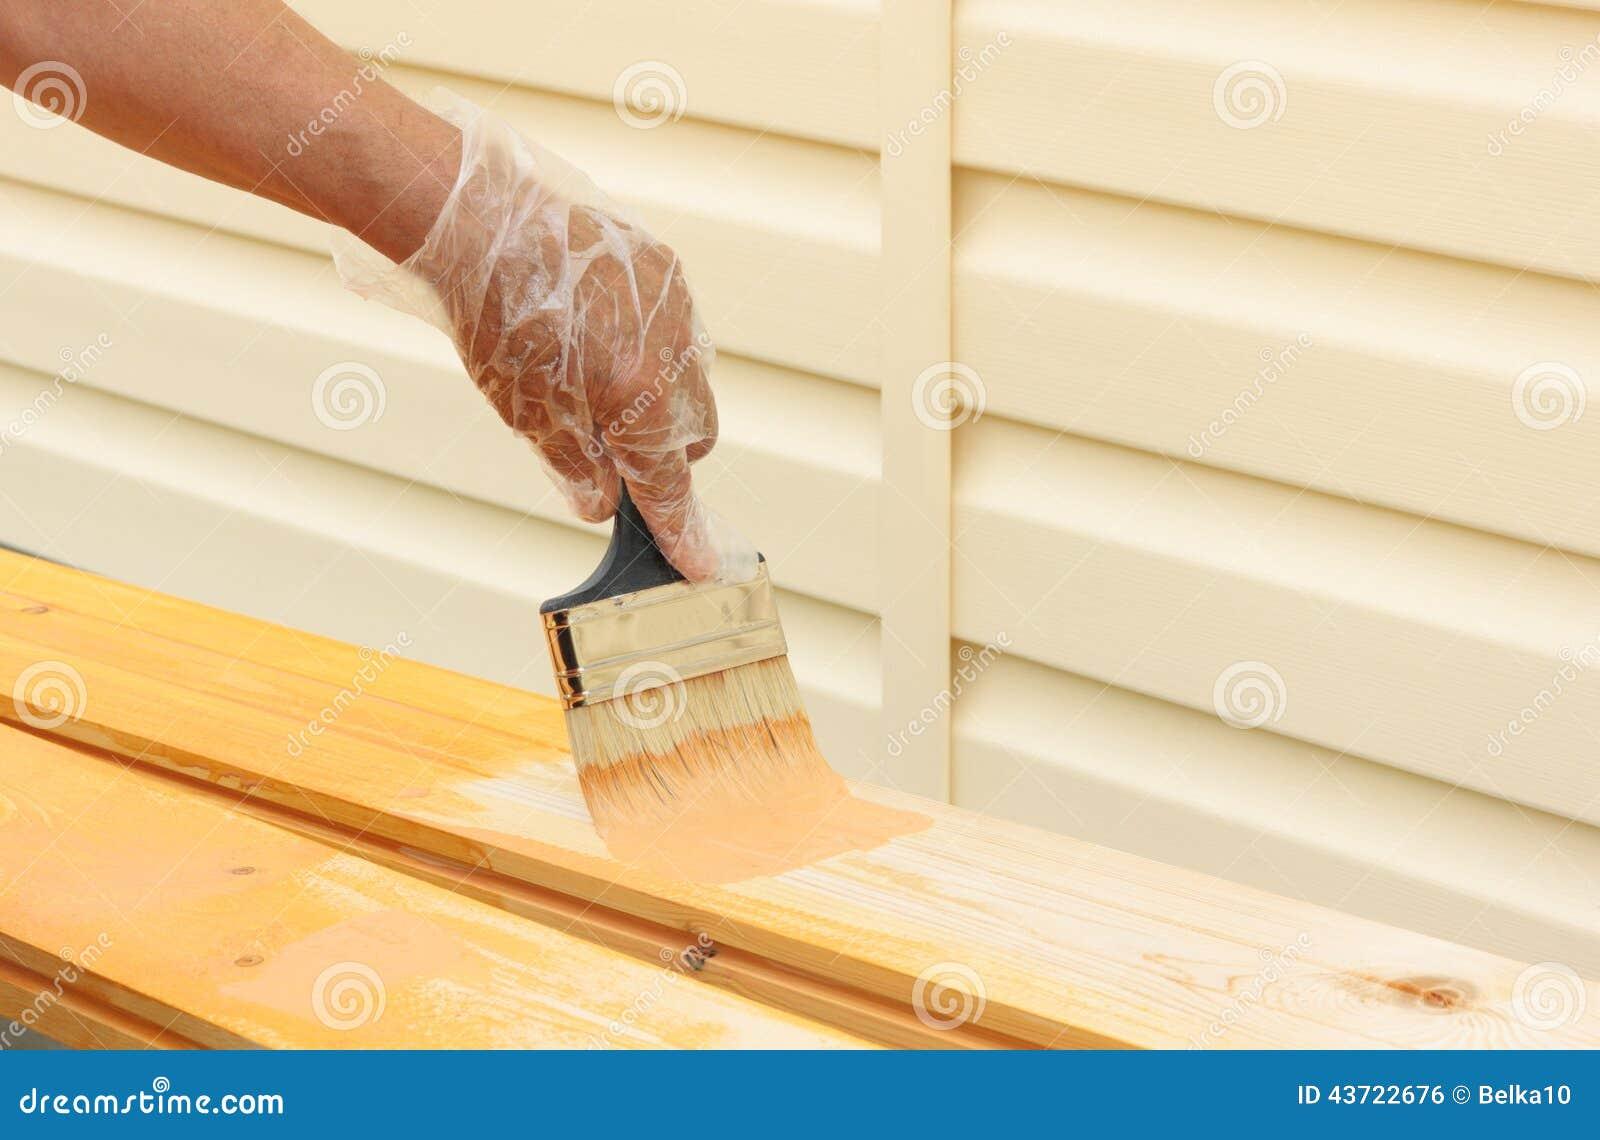 Painting Enamel On Bare Wood